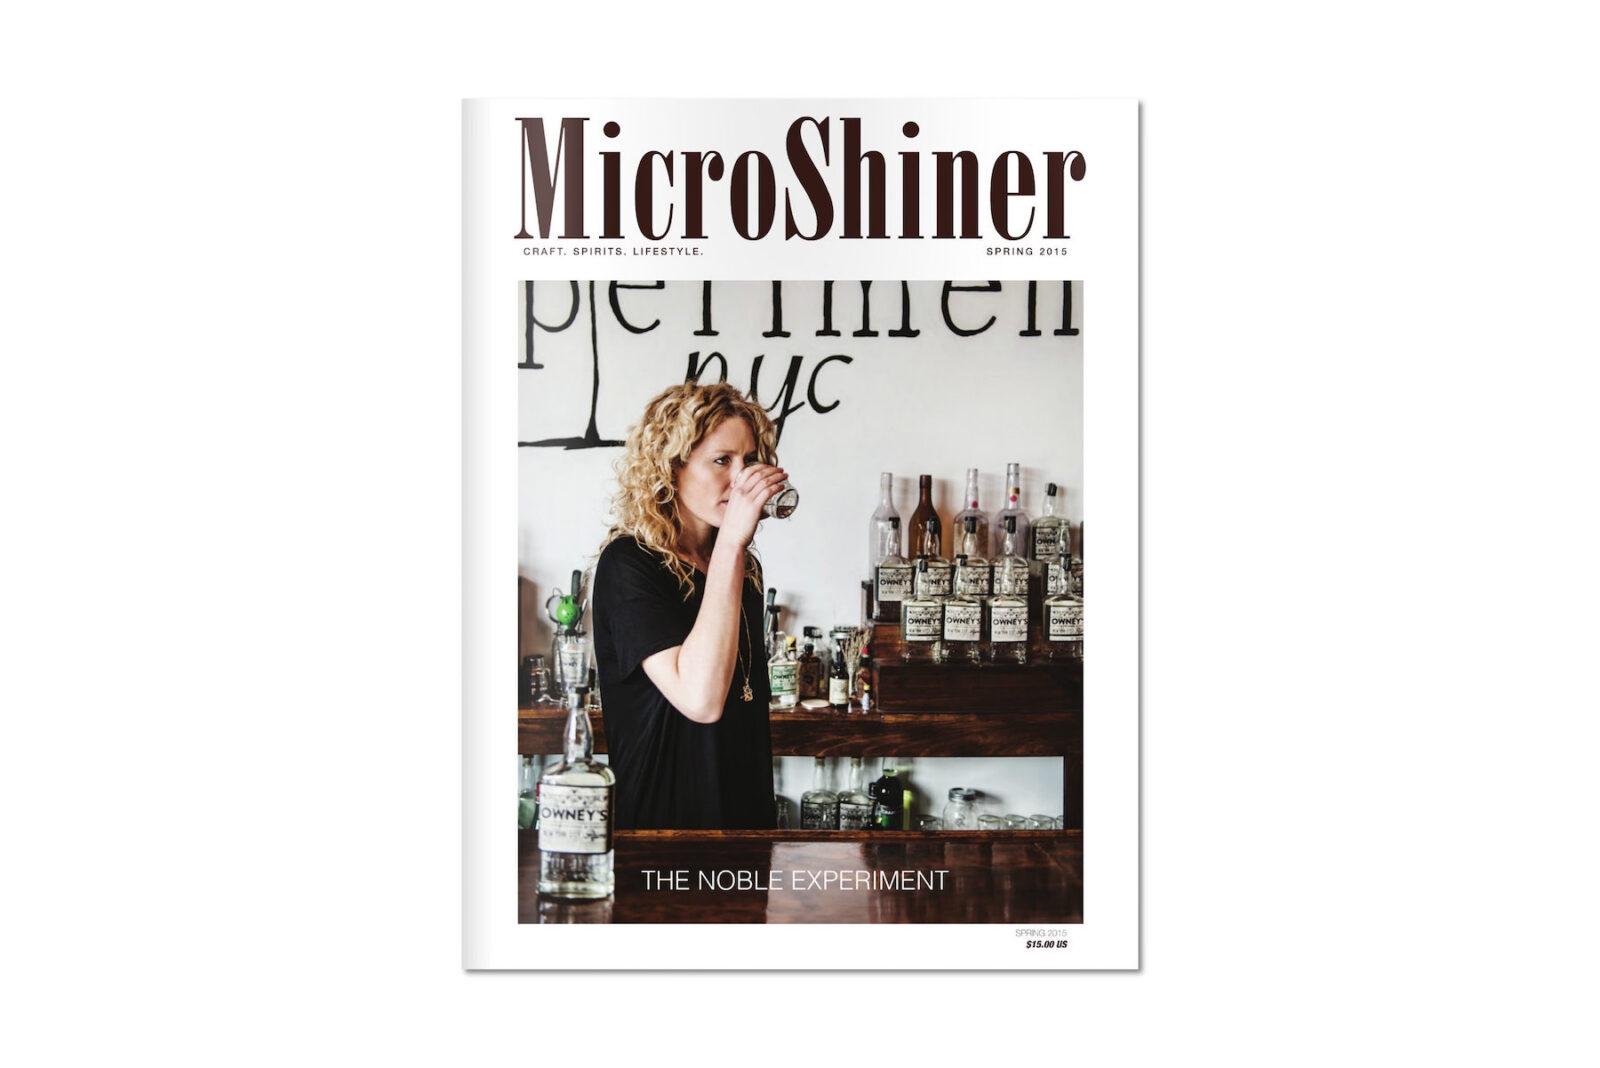 MicroShiner Magazine 1600x1068 - MicroShiner - Spring 2015